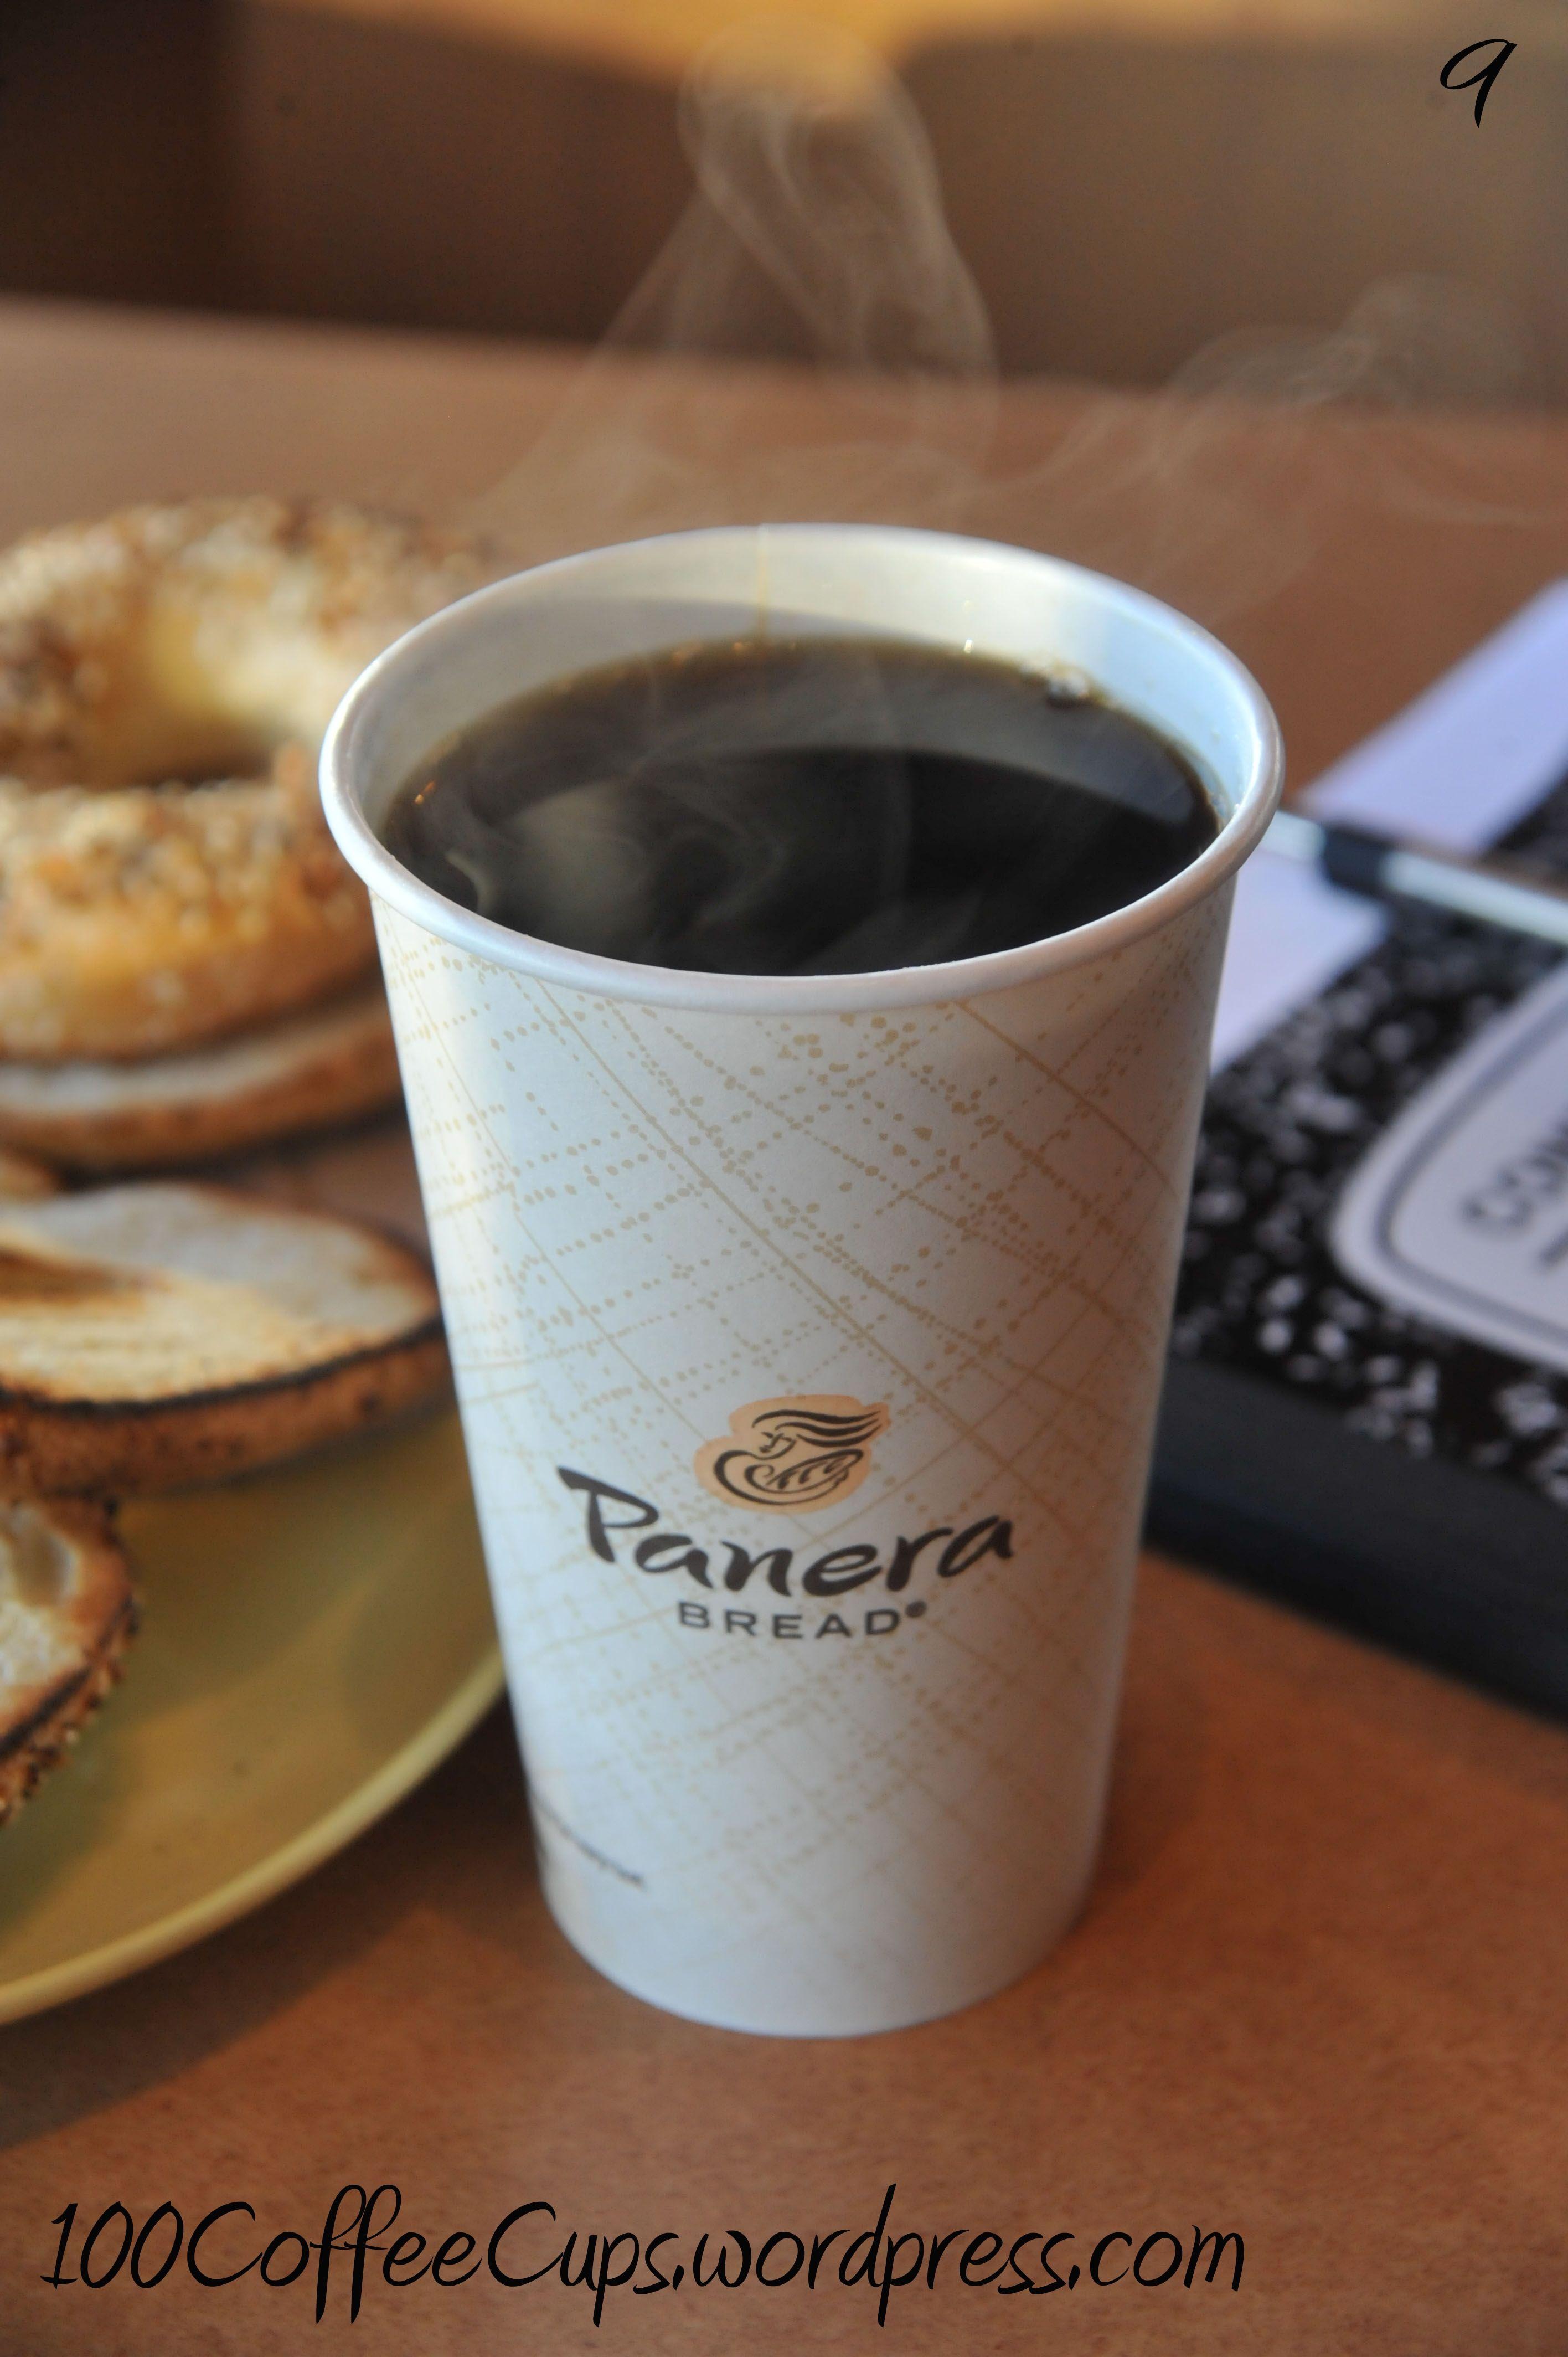 panera bread coffee cups coffee mug pinterest panera bread